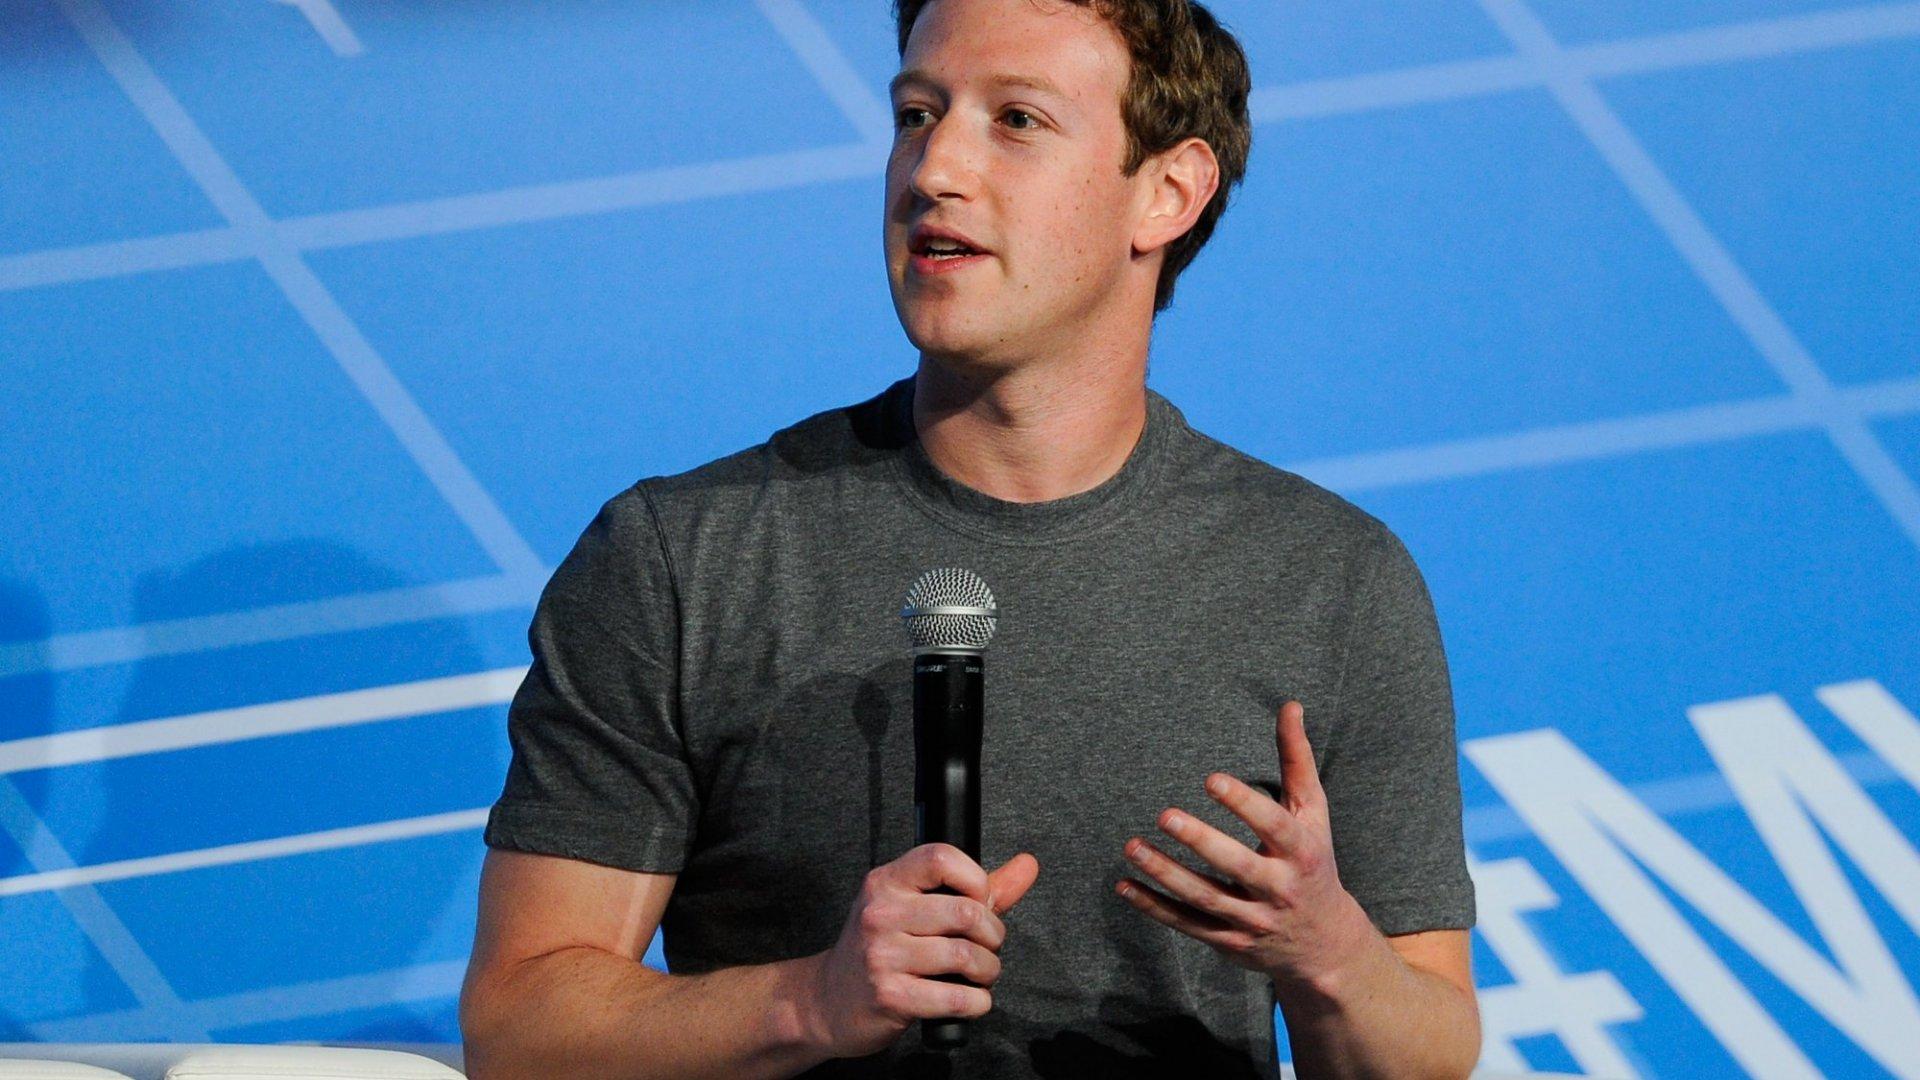 Mark Zuckerberg's Net Worth Drops $3.7 Billion in After-Hours Trading